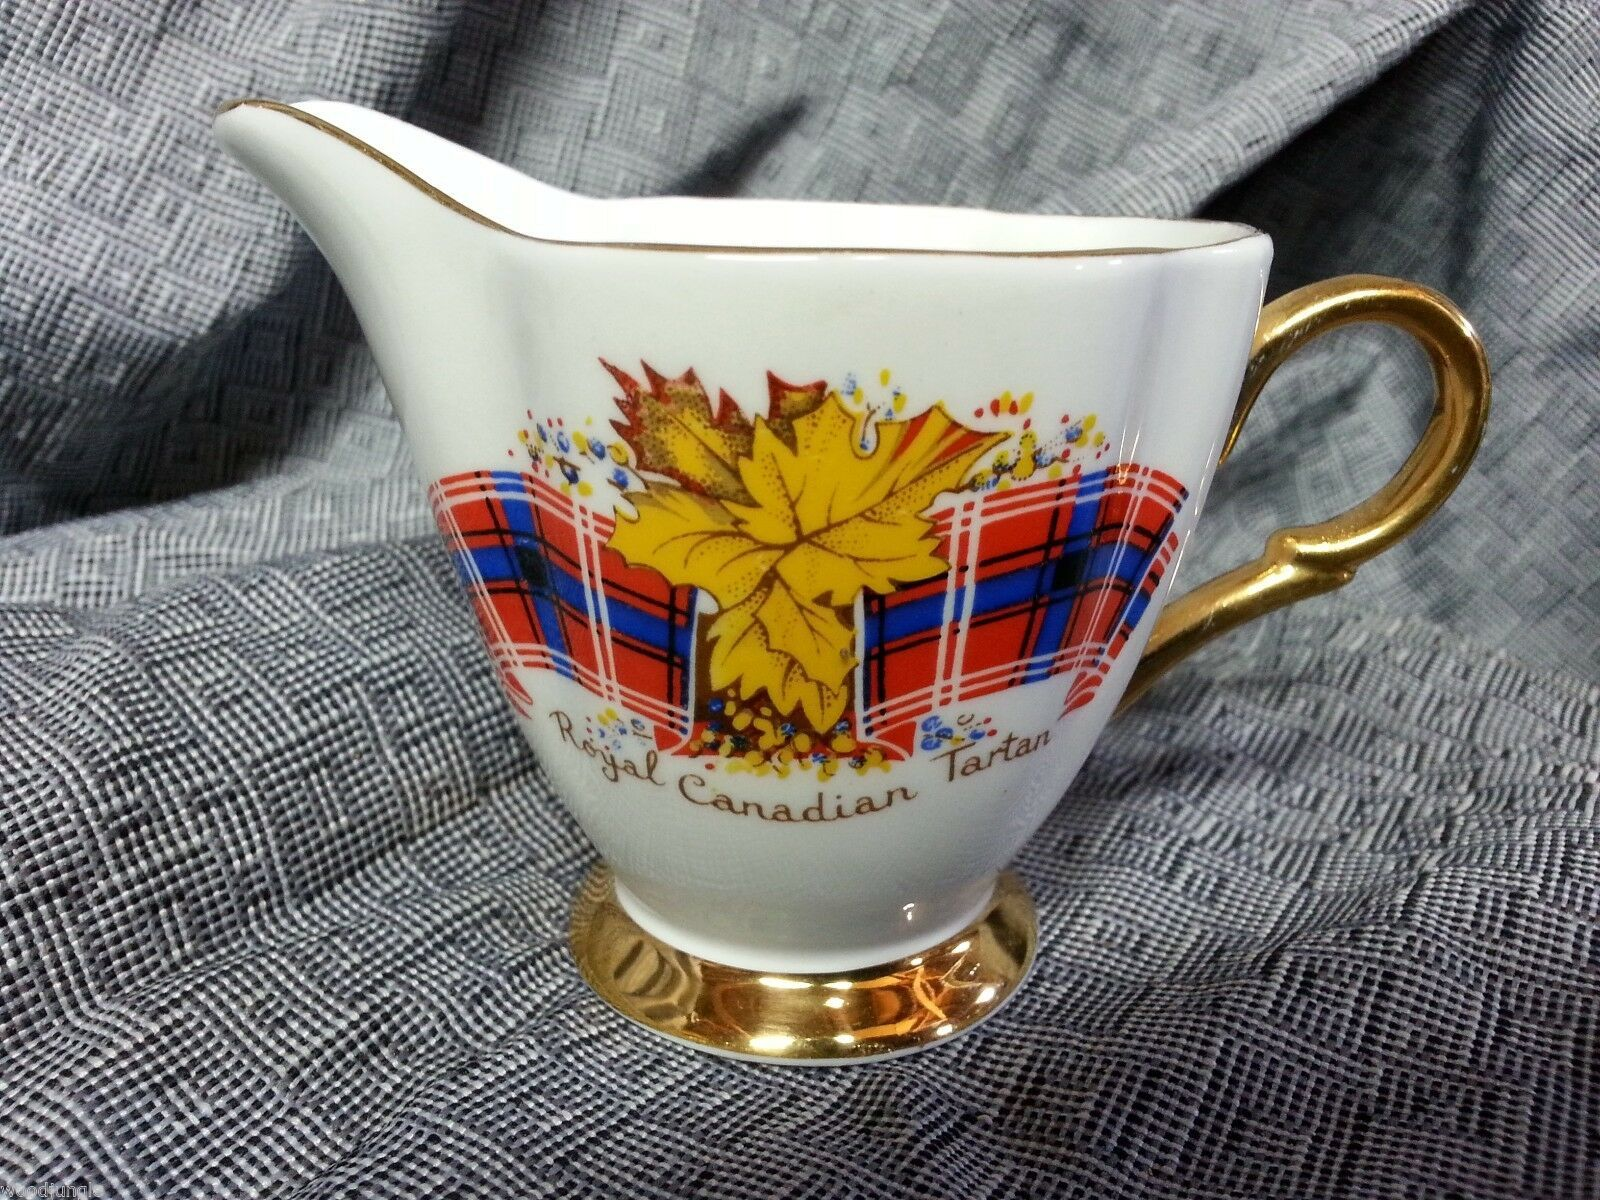 Vintage ROYAL CANADIAN TARTAN COFFEE CREAMER CANADA DISH